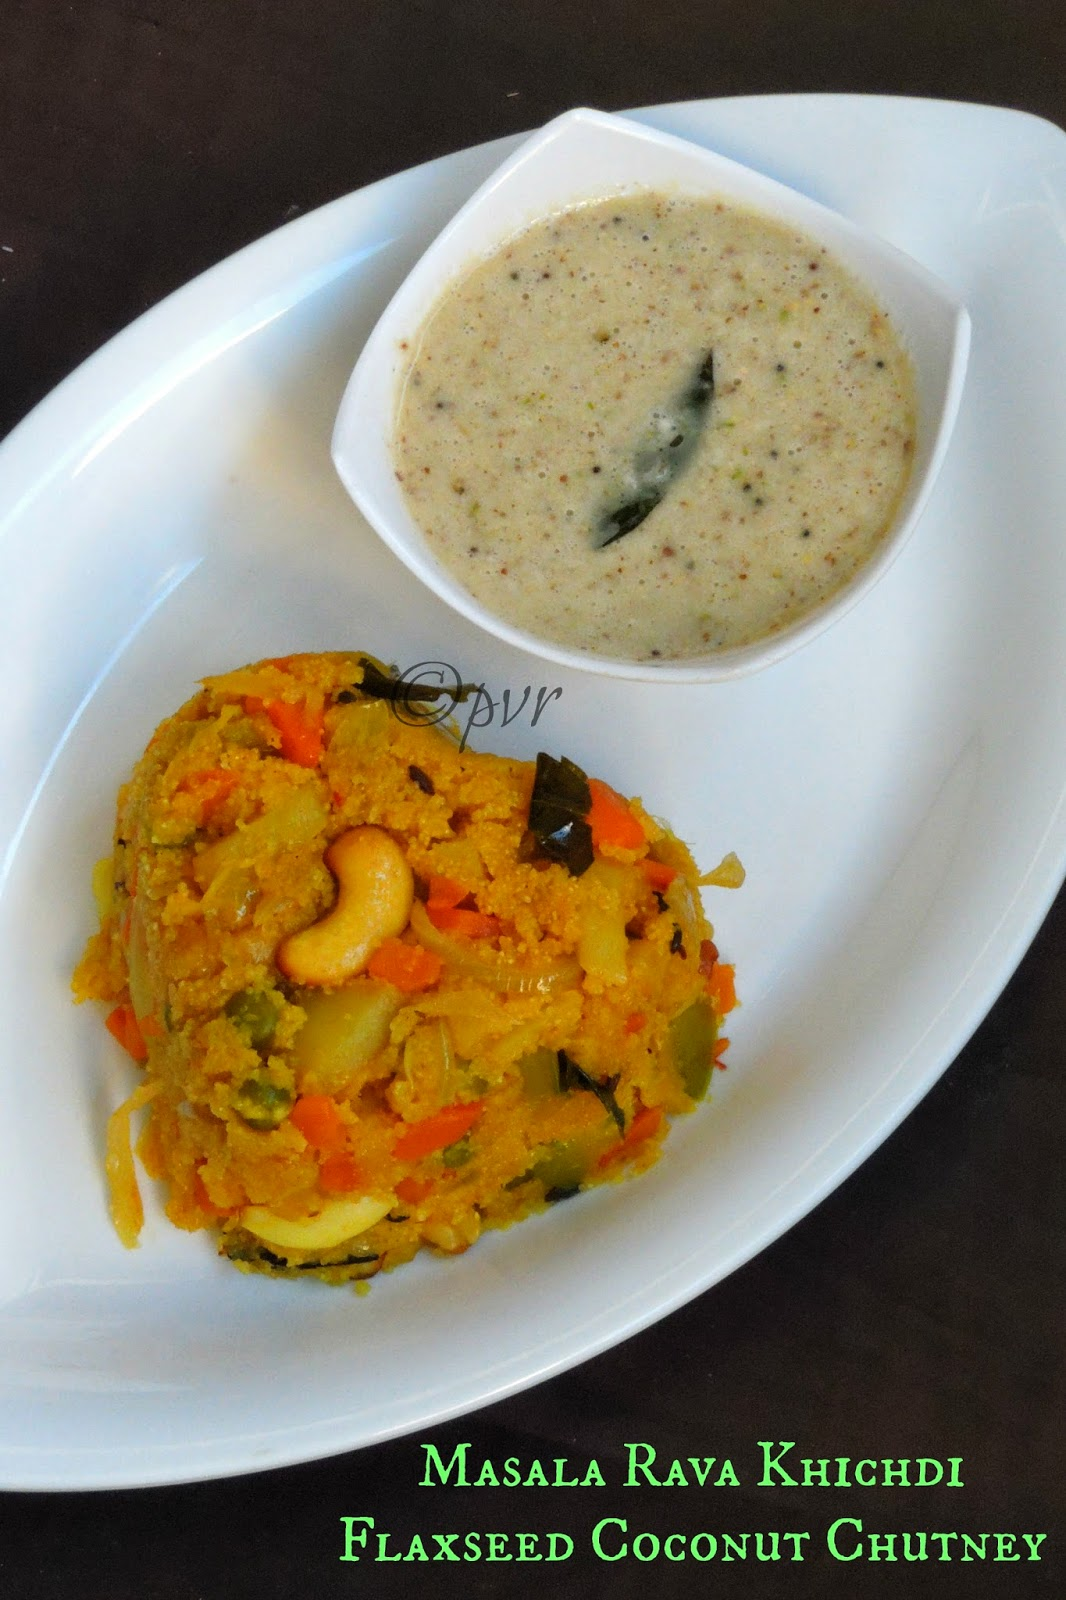 Masala Rava Khichdi, flaxseed chutney